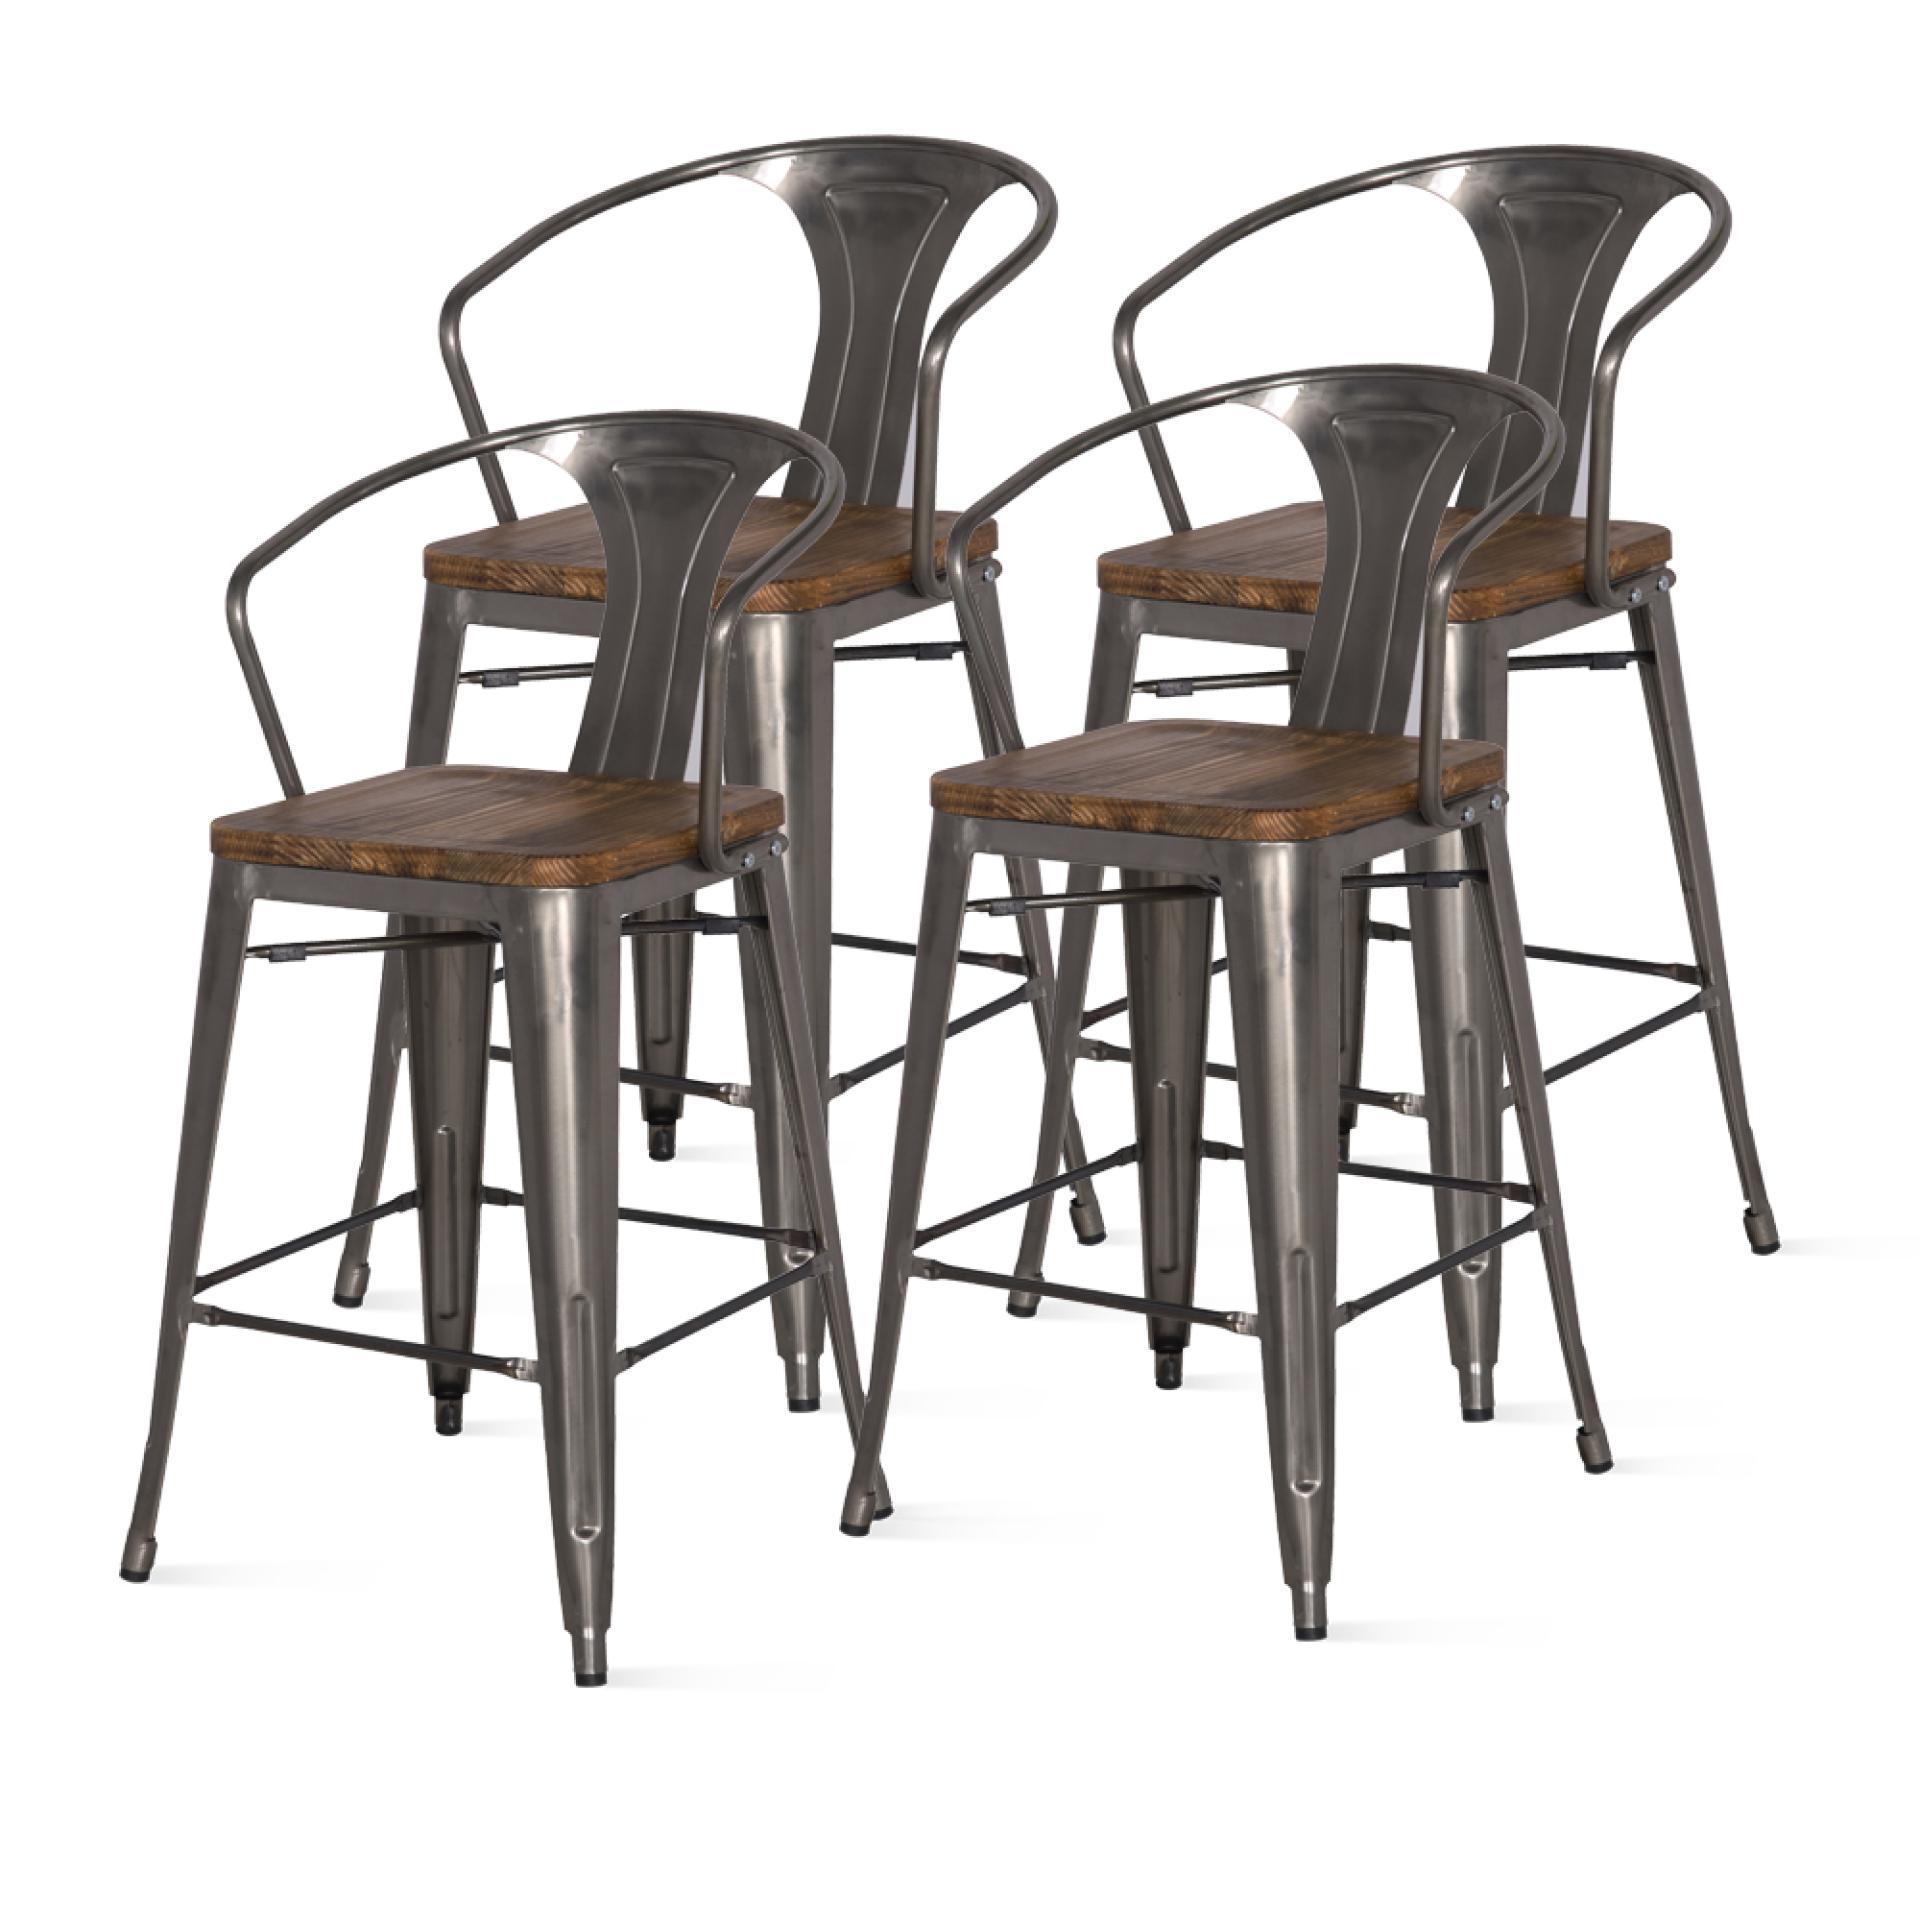 938541 Gm Npd Furniture Wholesale Lifestyle Furniture